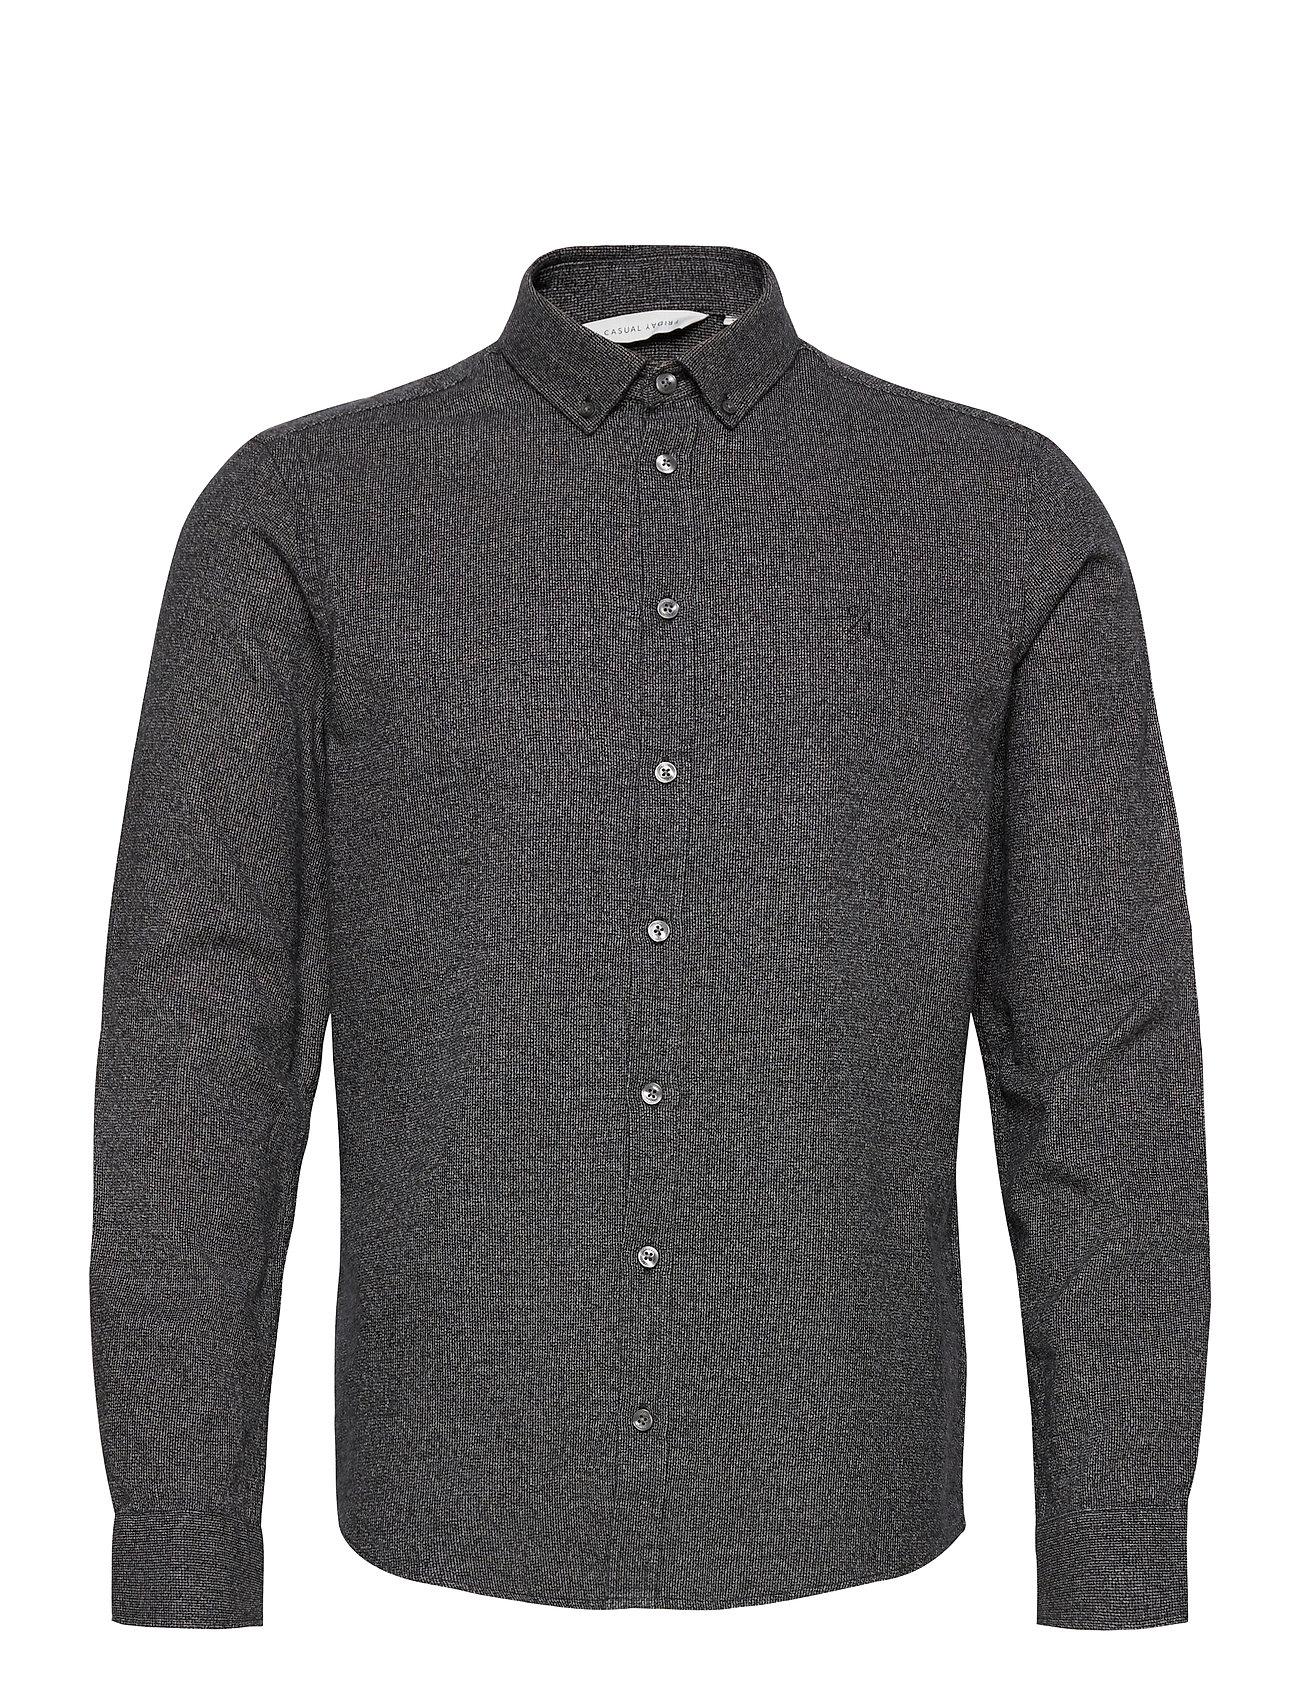 Image of Arthurbd Ls Shirt Skjorte Casual Sort Casual Friday (3459862359)